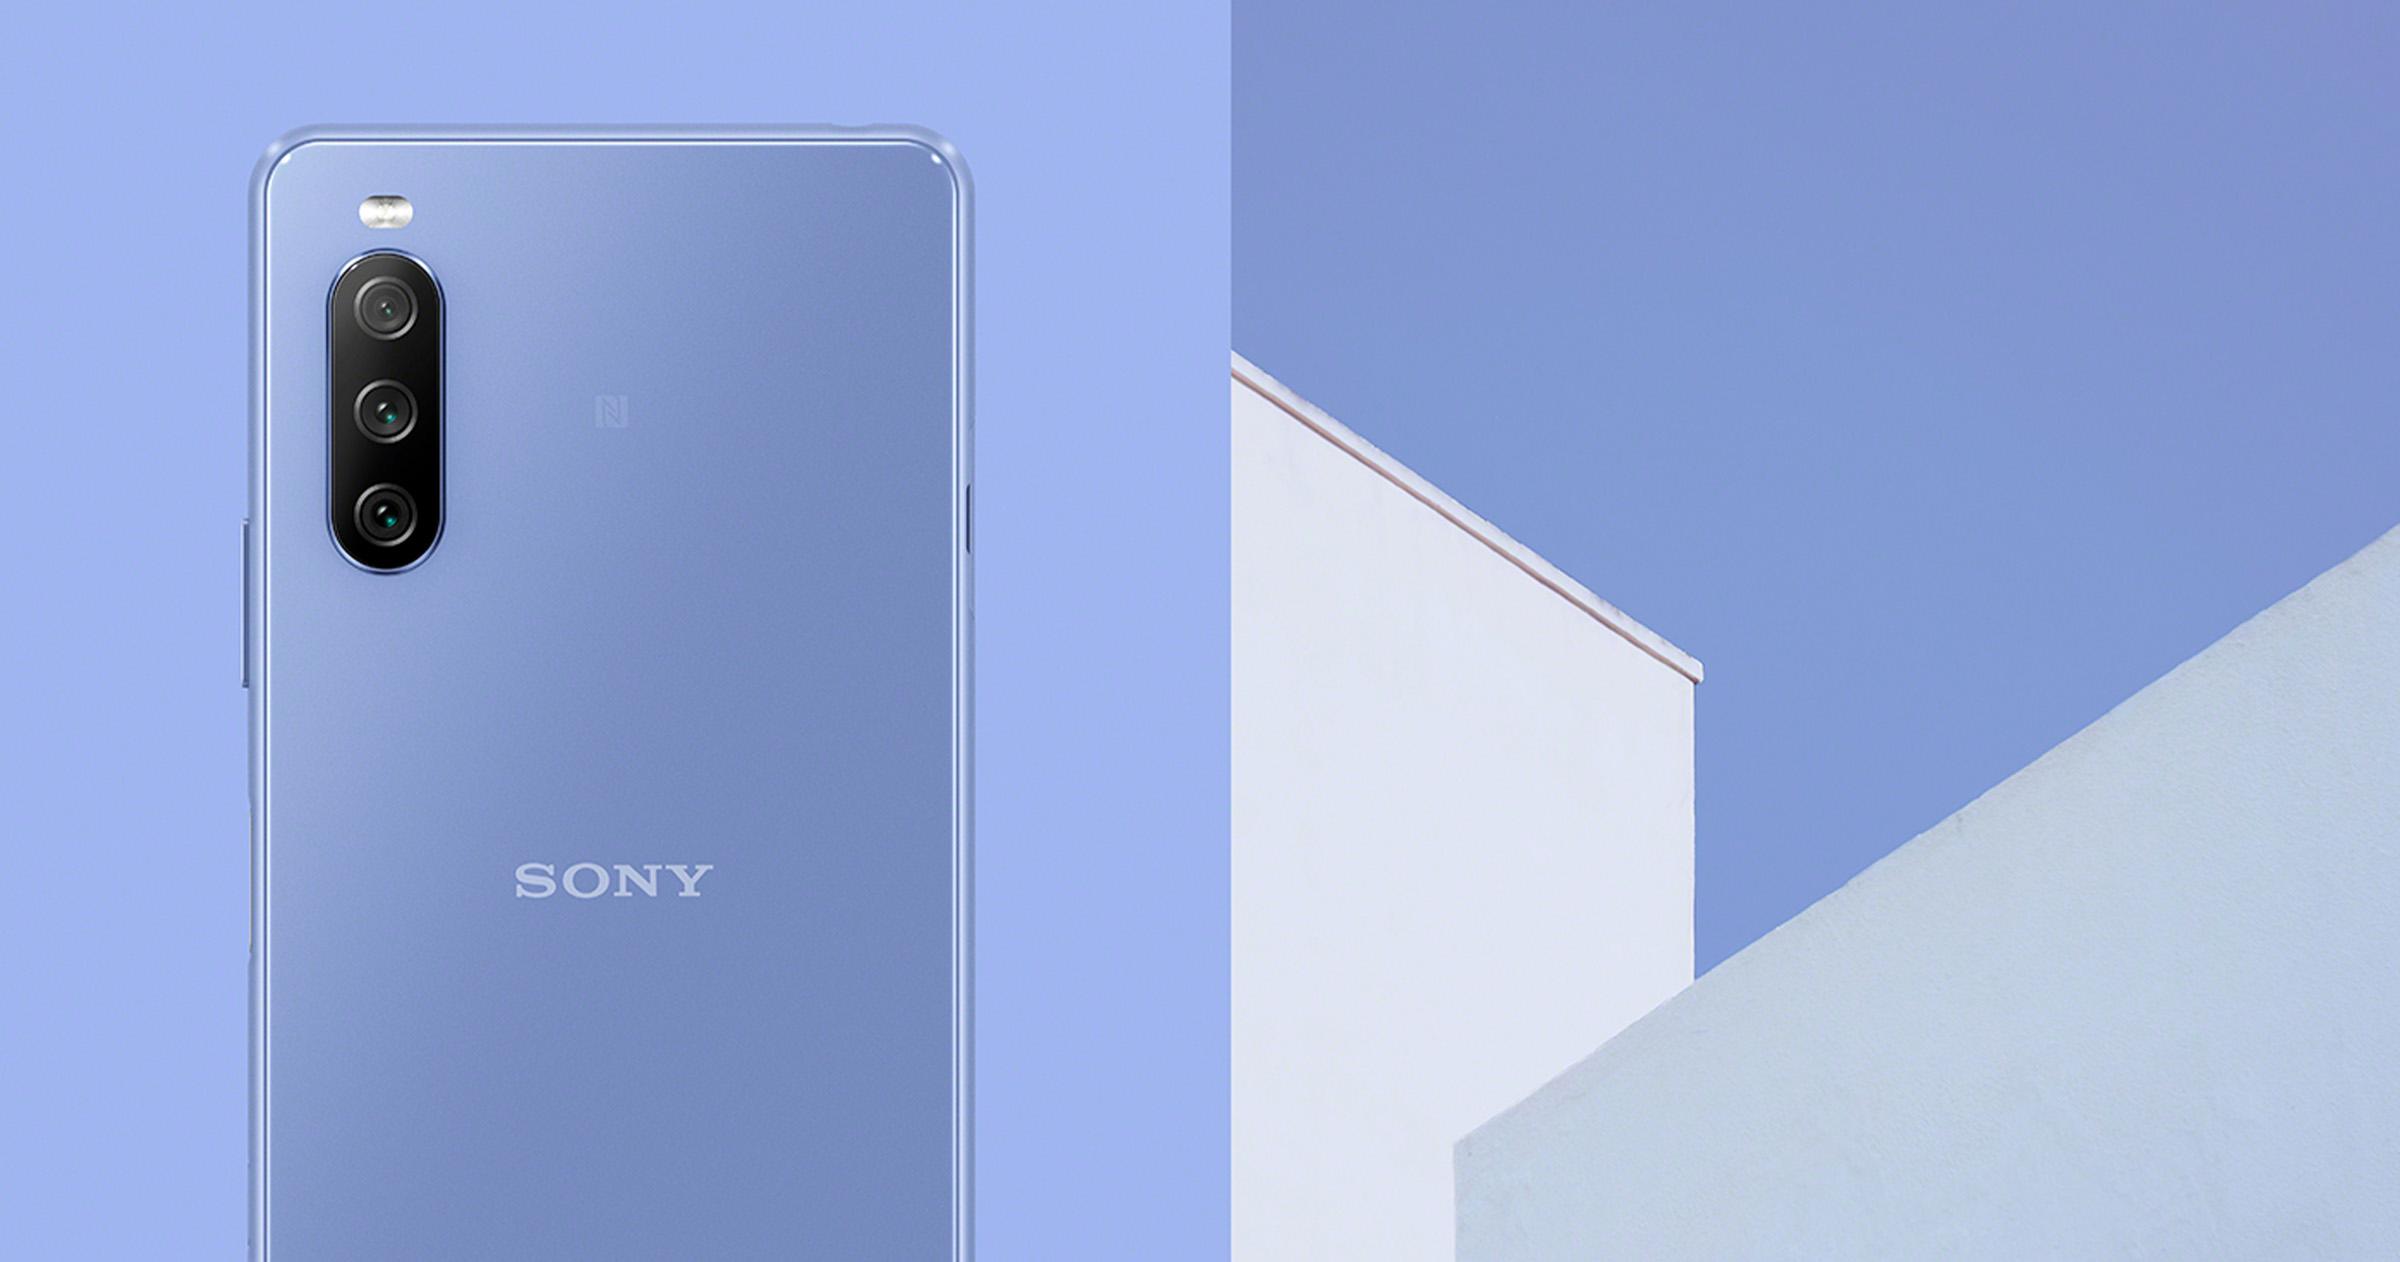 Le Sony Xperia 10 III en bleu